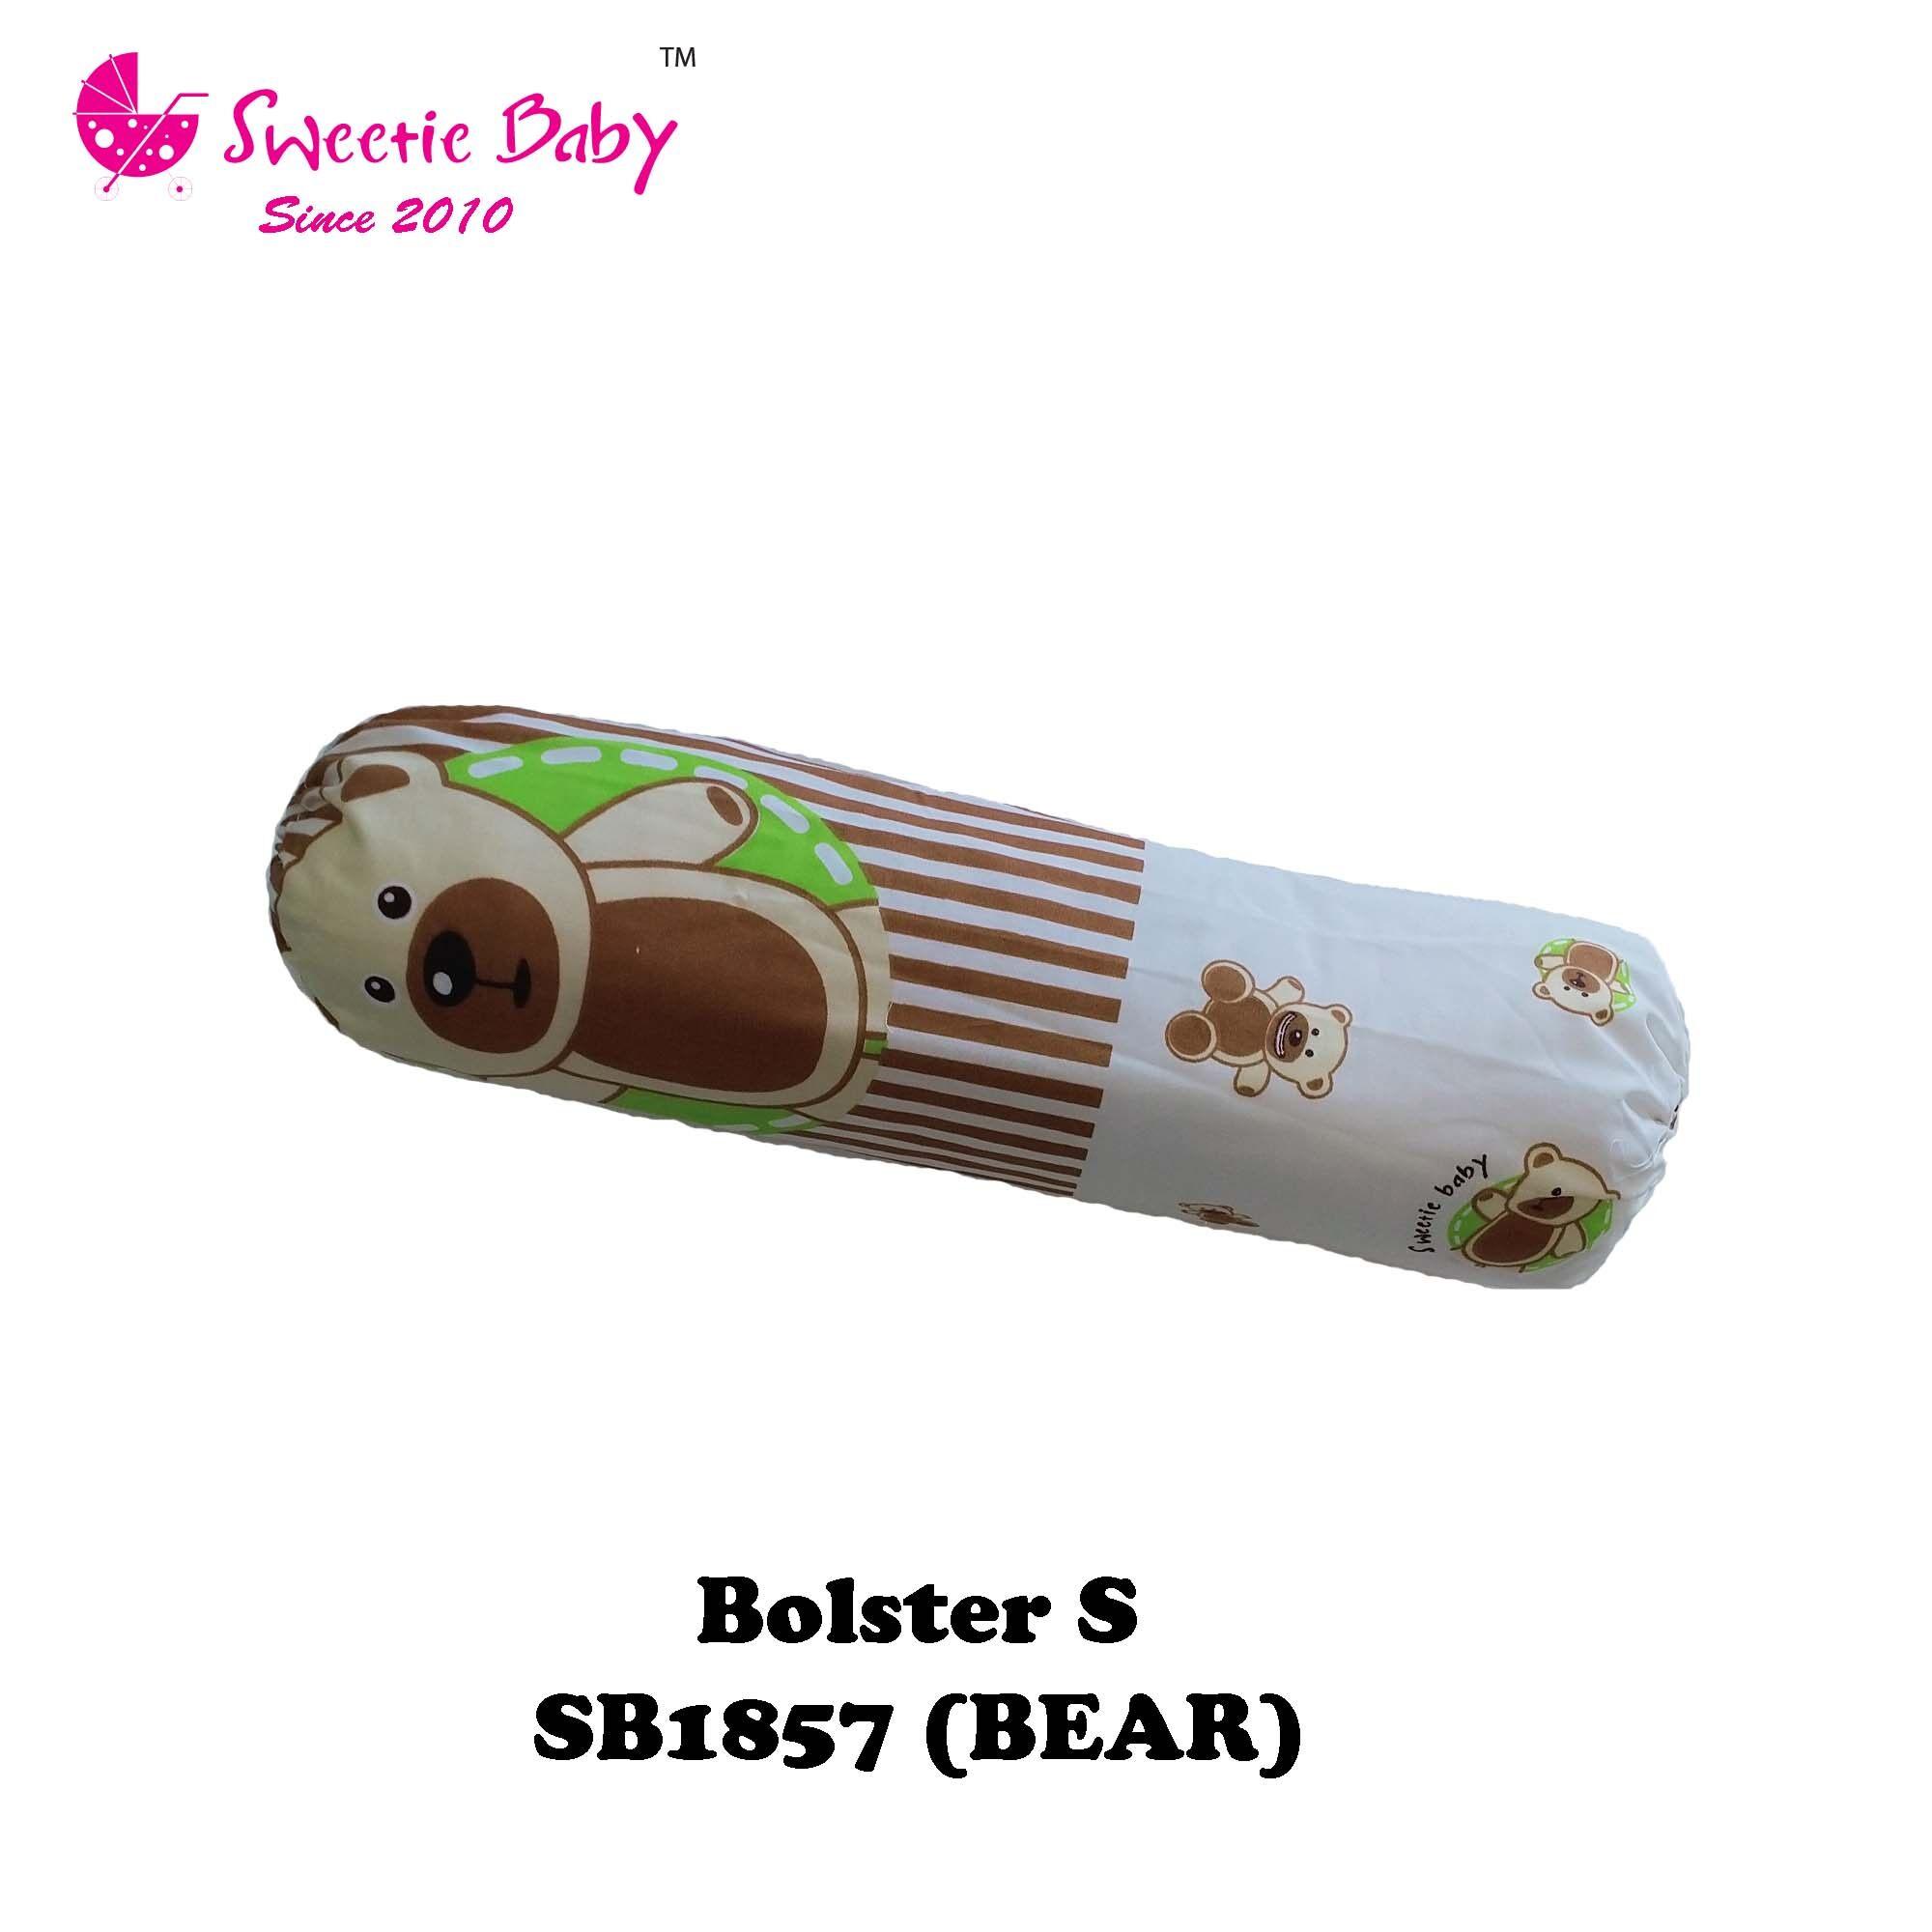 Sweetie Baby Bolster S For Baby Sleep Well